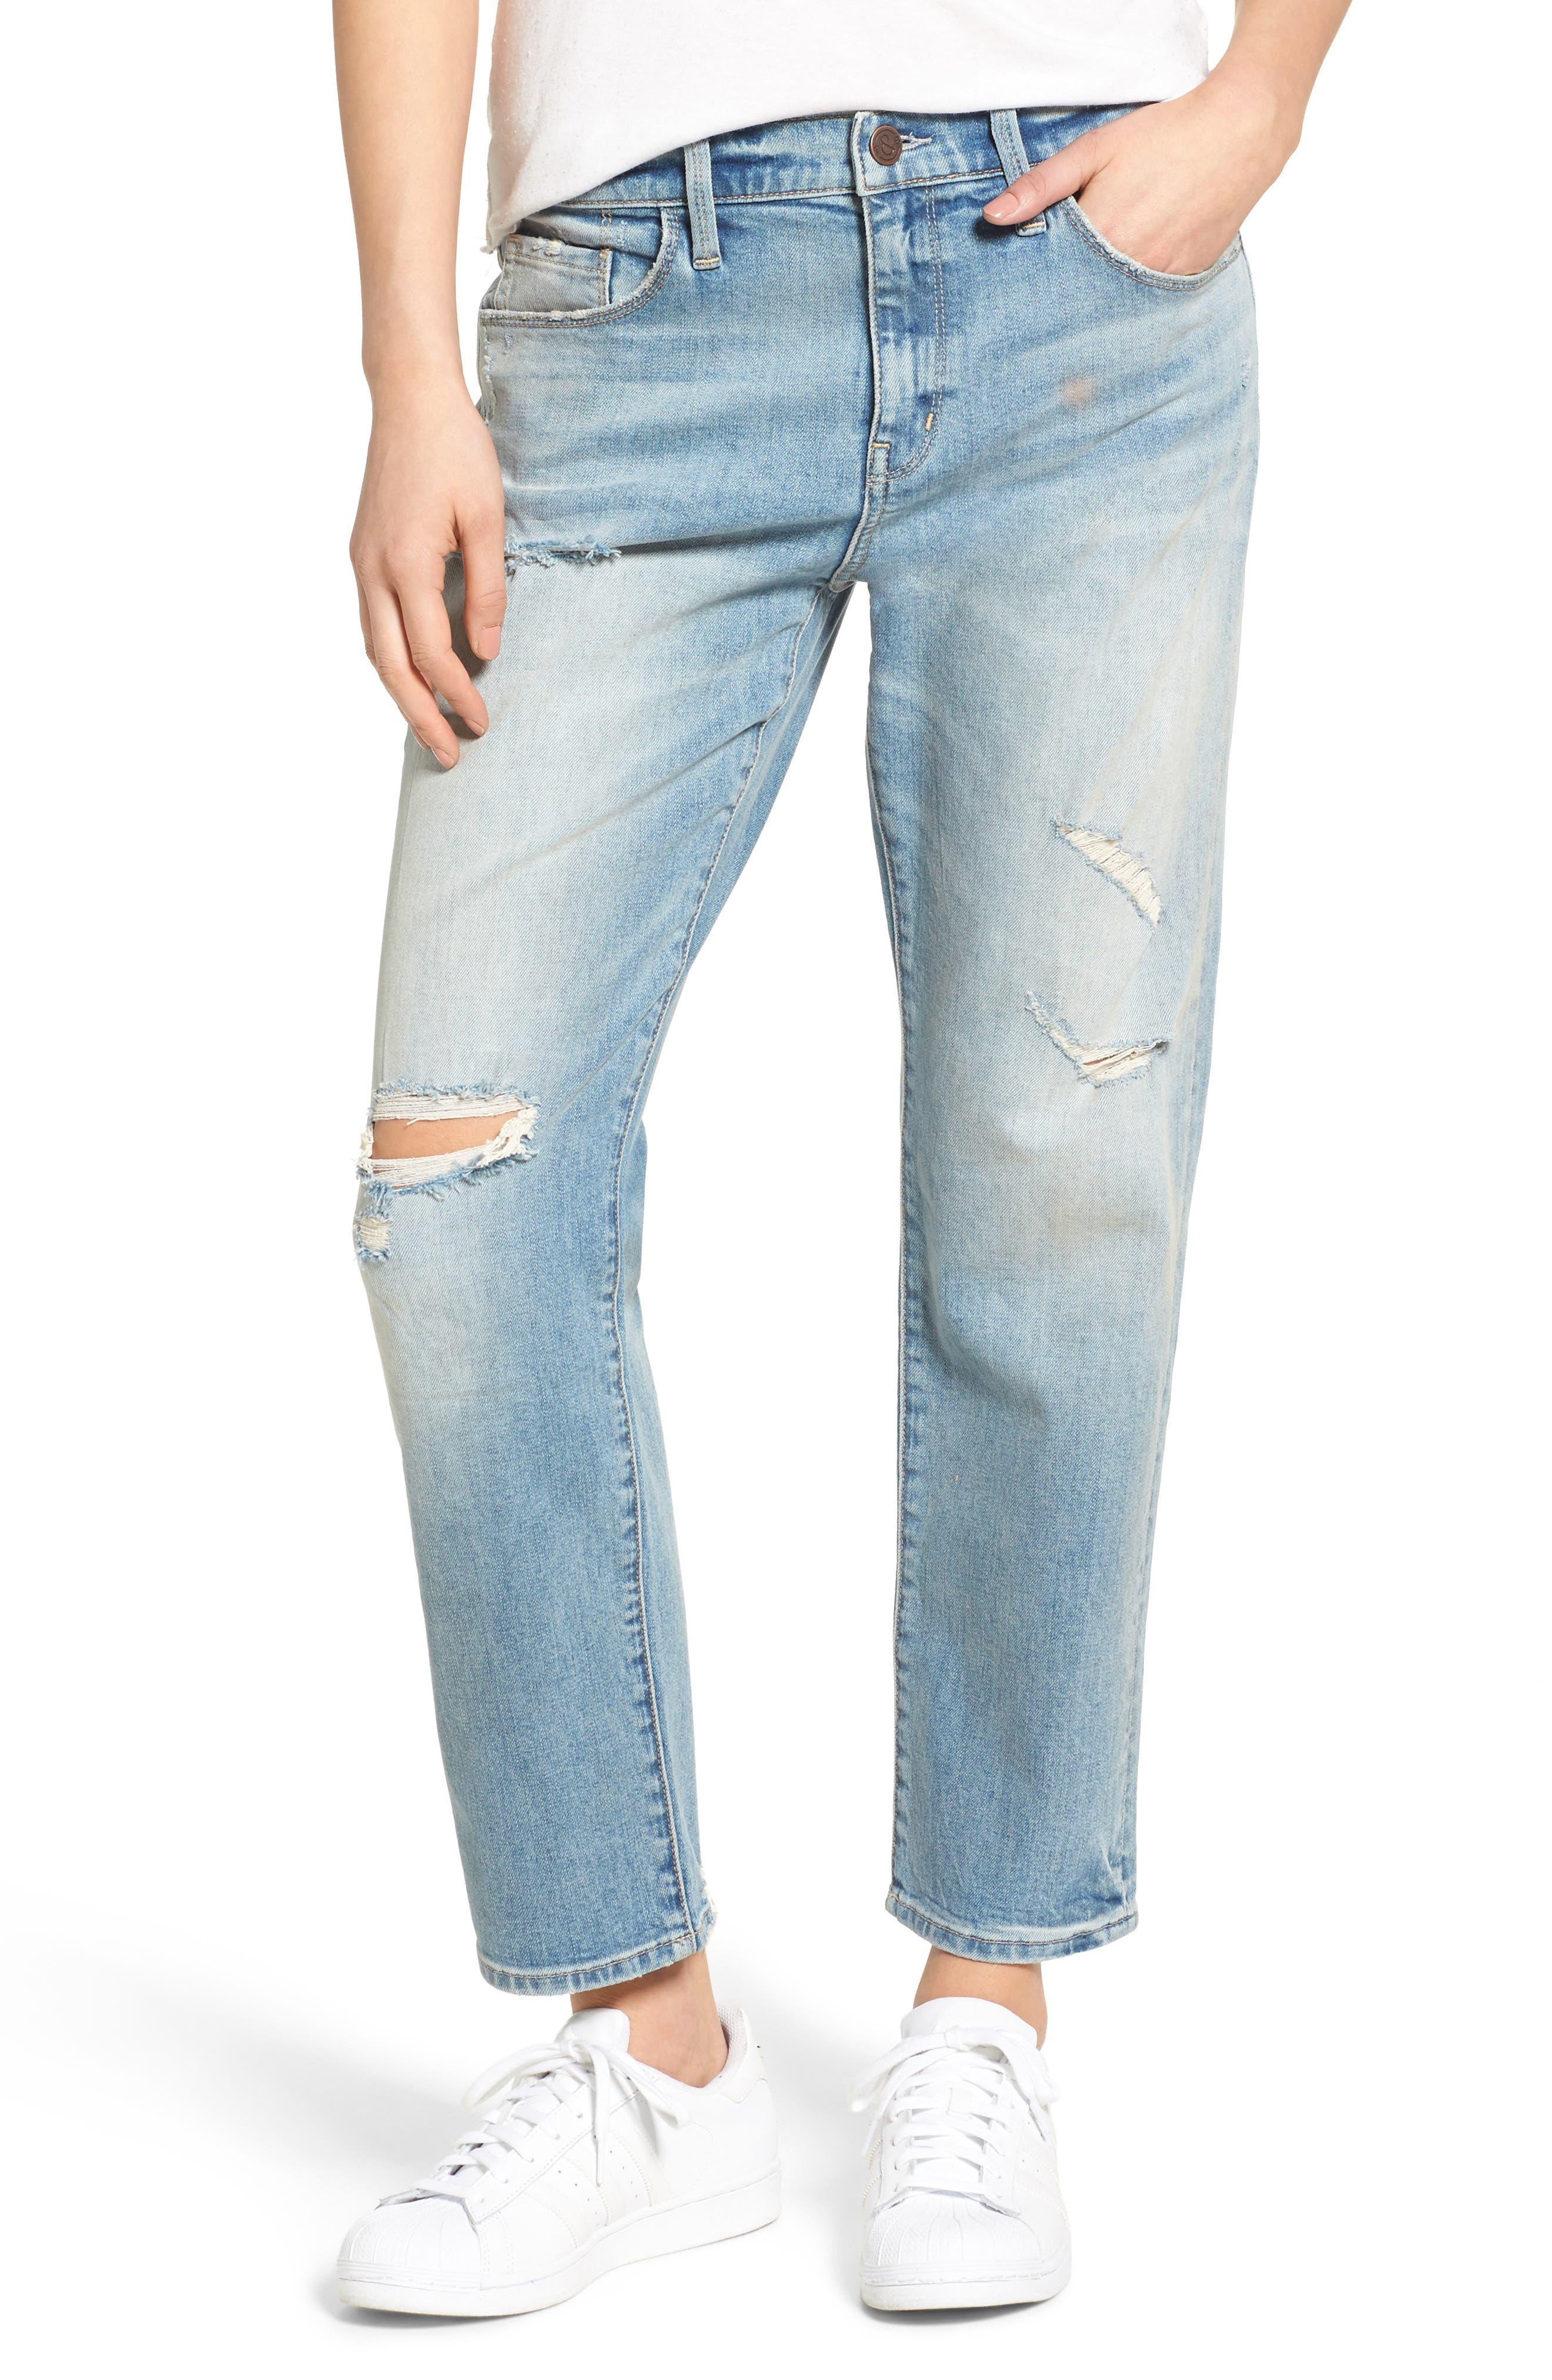 TREASURE & BOND,                             Boyfriend Jeans,                             Main thumbnail 1, color,                             400